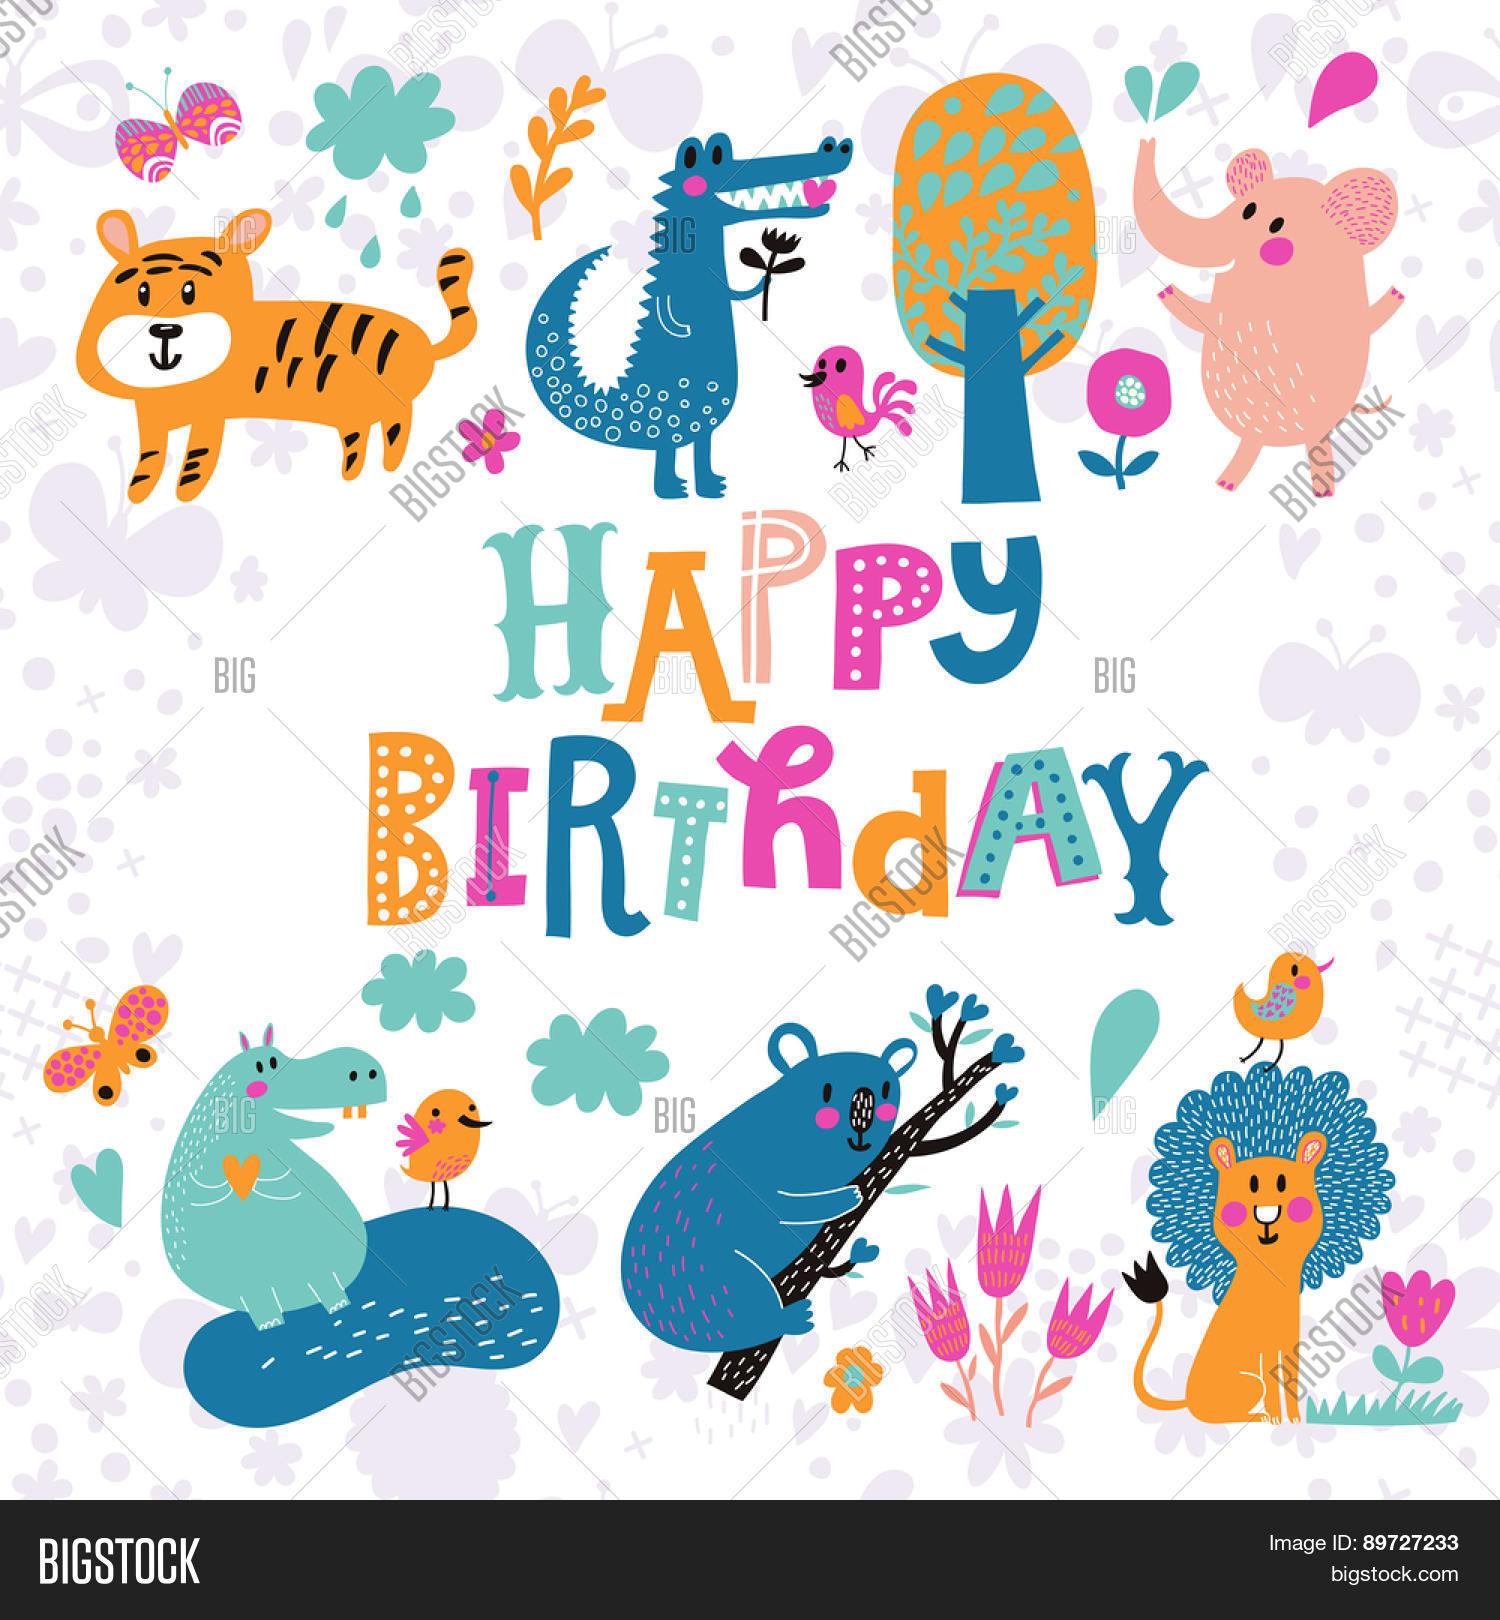 Sweet Card Crocodile Elephant Vector Photo Bigstock - Birthday invitation background vector